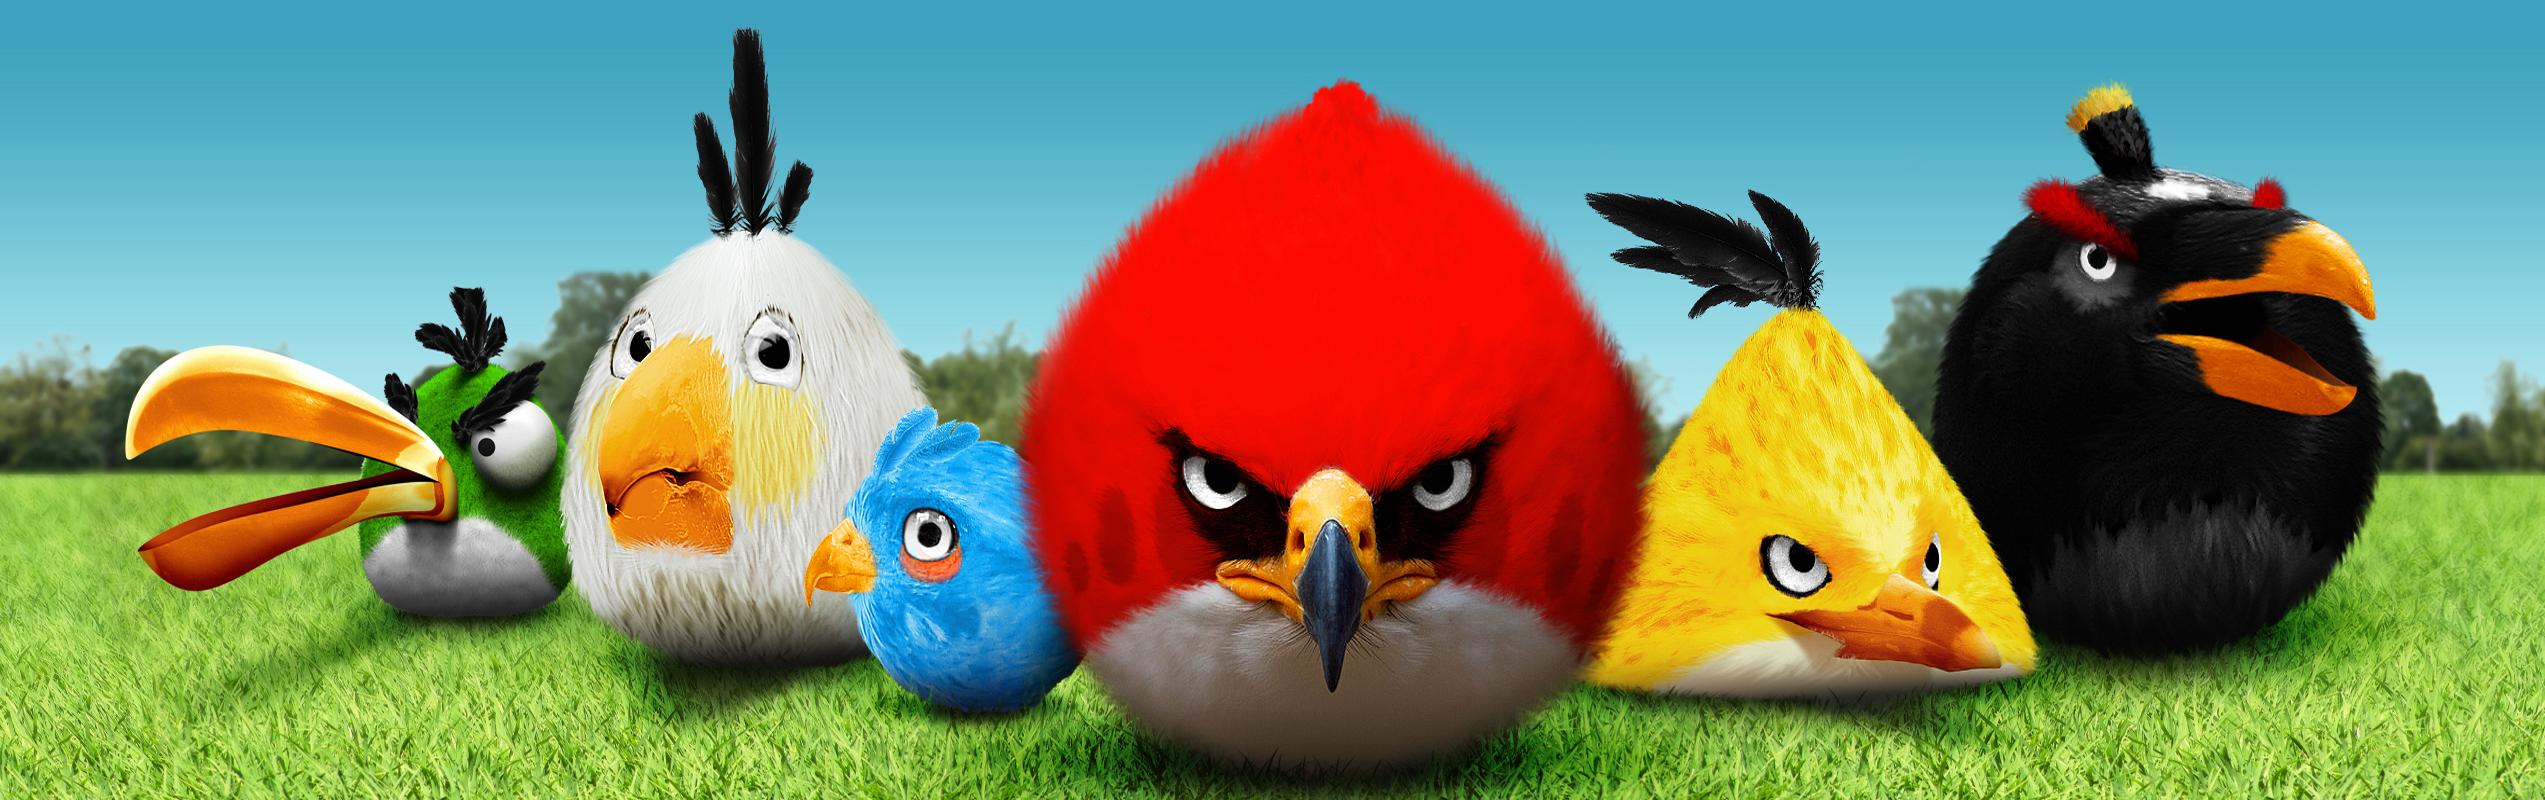 Angry birds pchdwallpaper pchdwallpaper voltagebd Images